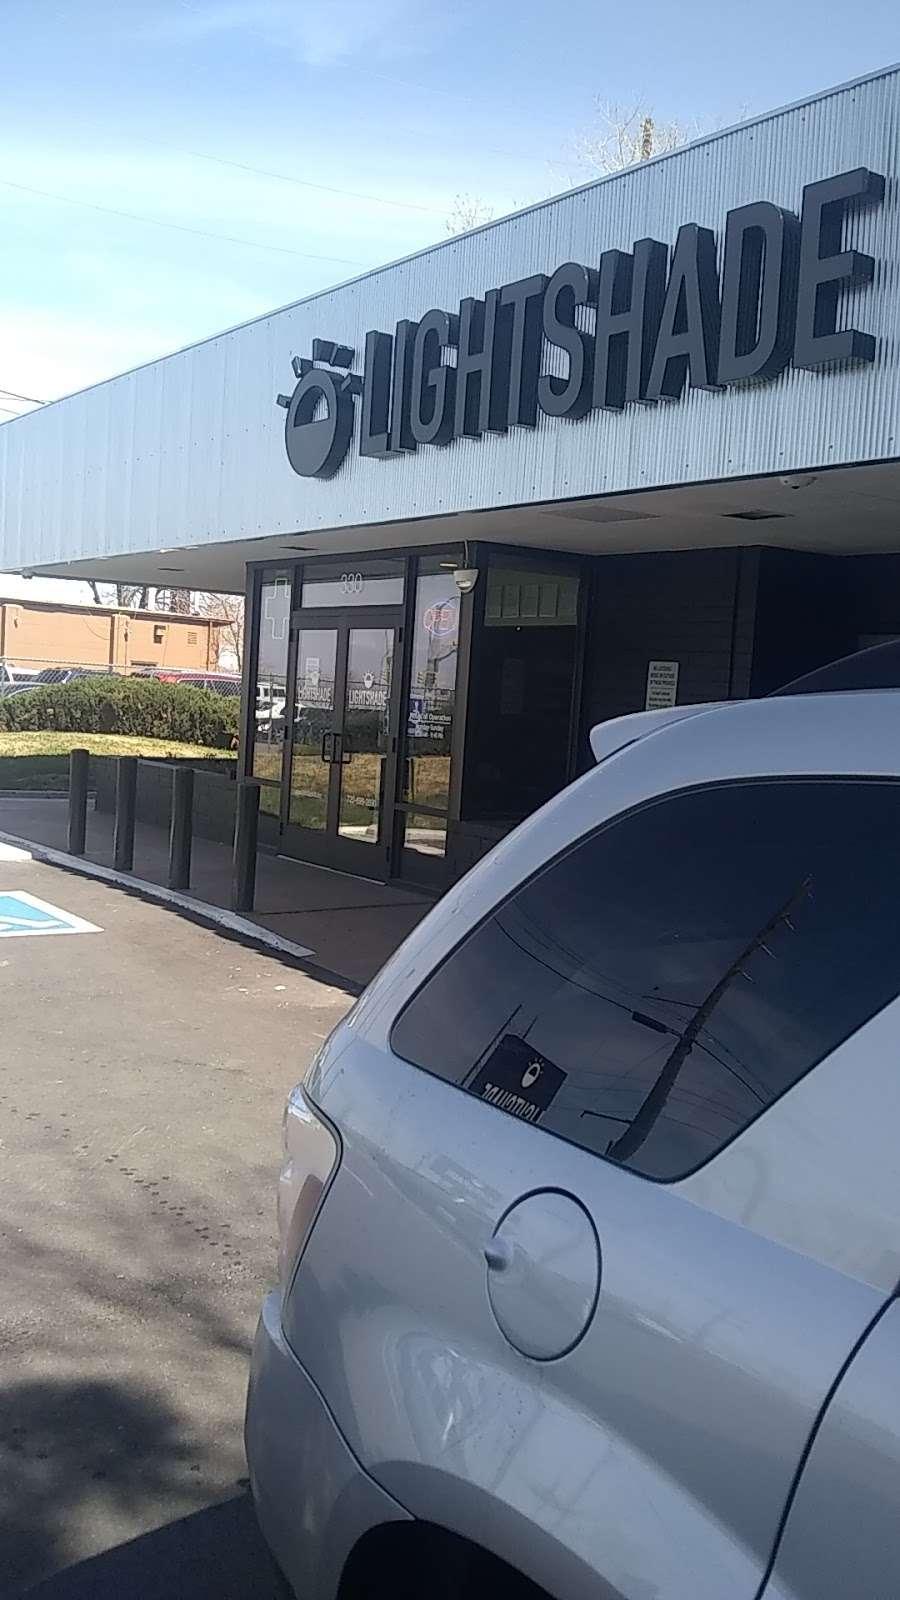 Lightshade Rec & Med Dispensary - health  | Photo 2 of 10 | Address: 330 S Dayton St, Denver, CO 80247, USA | Phone: (720) 699-2690